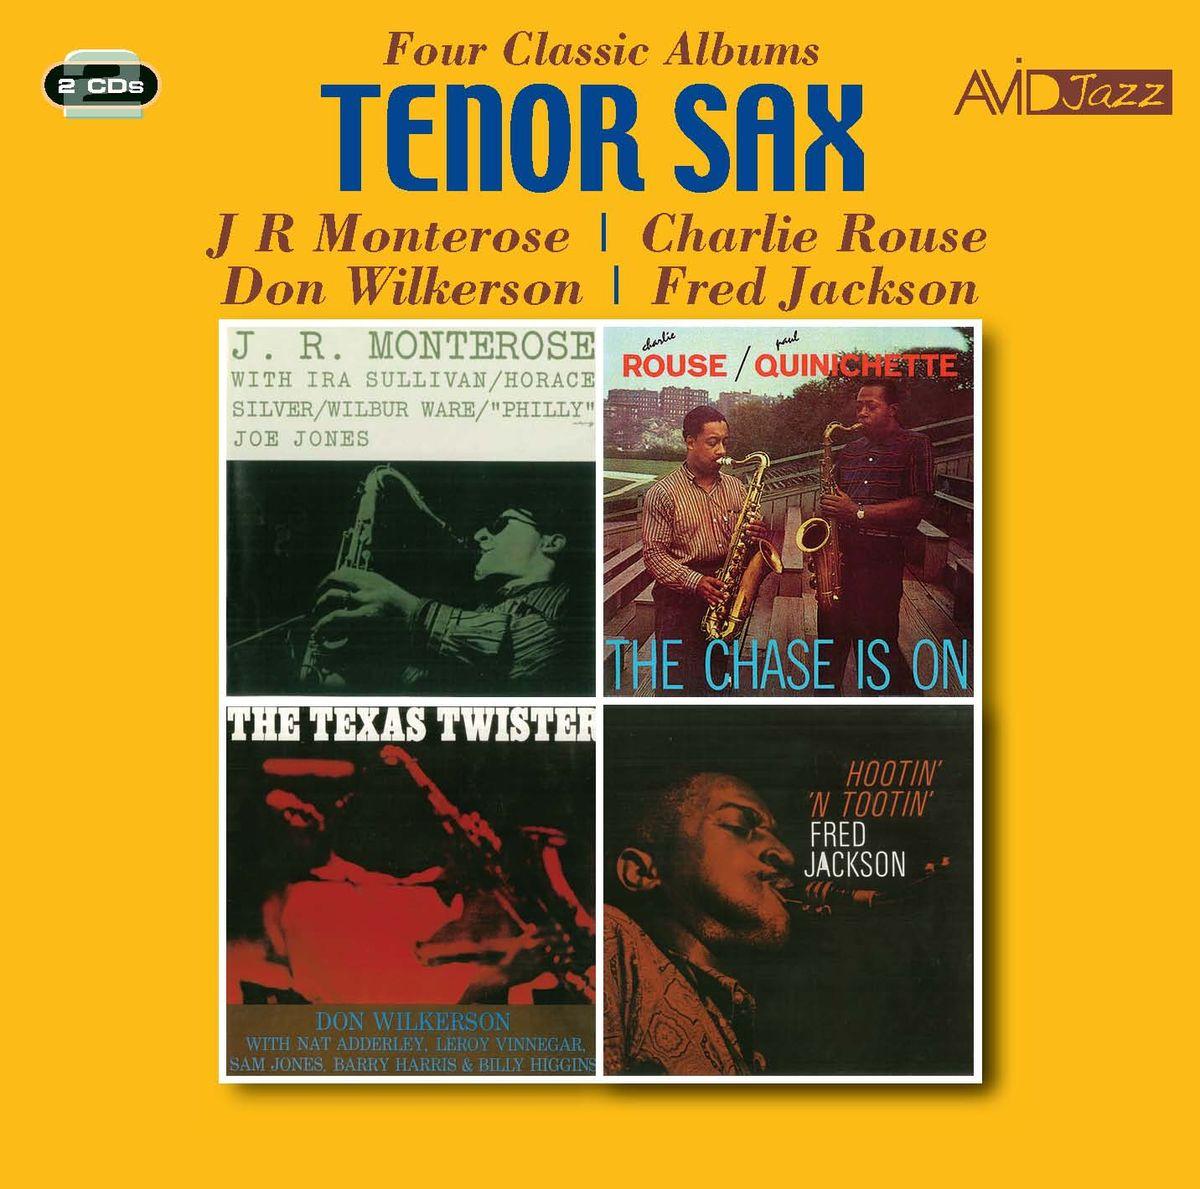 цена на J. R. Monterose, Charlie Rouse, Don Wilkerson, Fred Jackson. Tenor Sax - Four Classic Albums (2 CD)